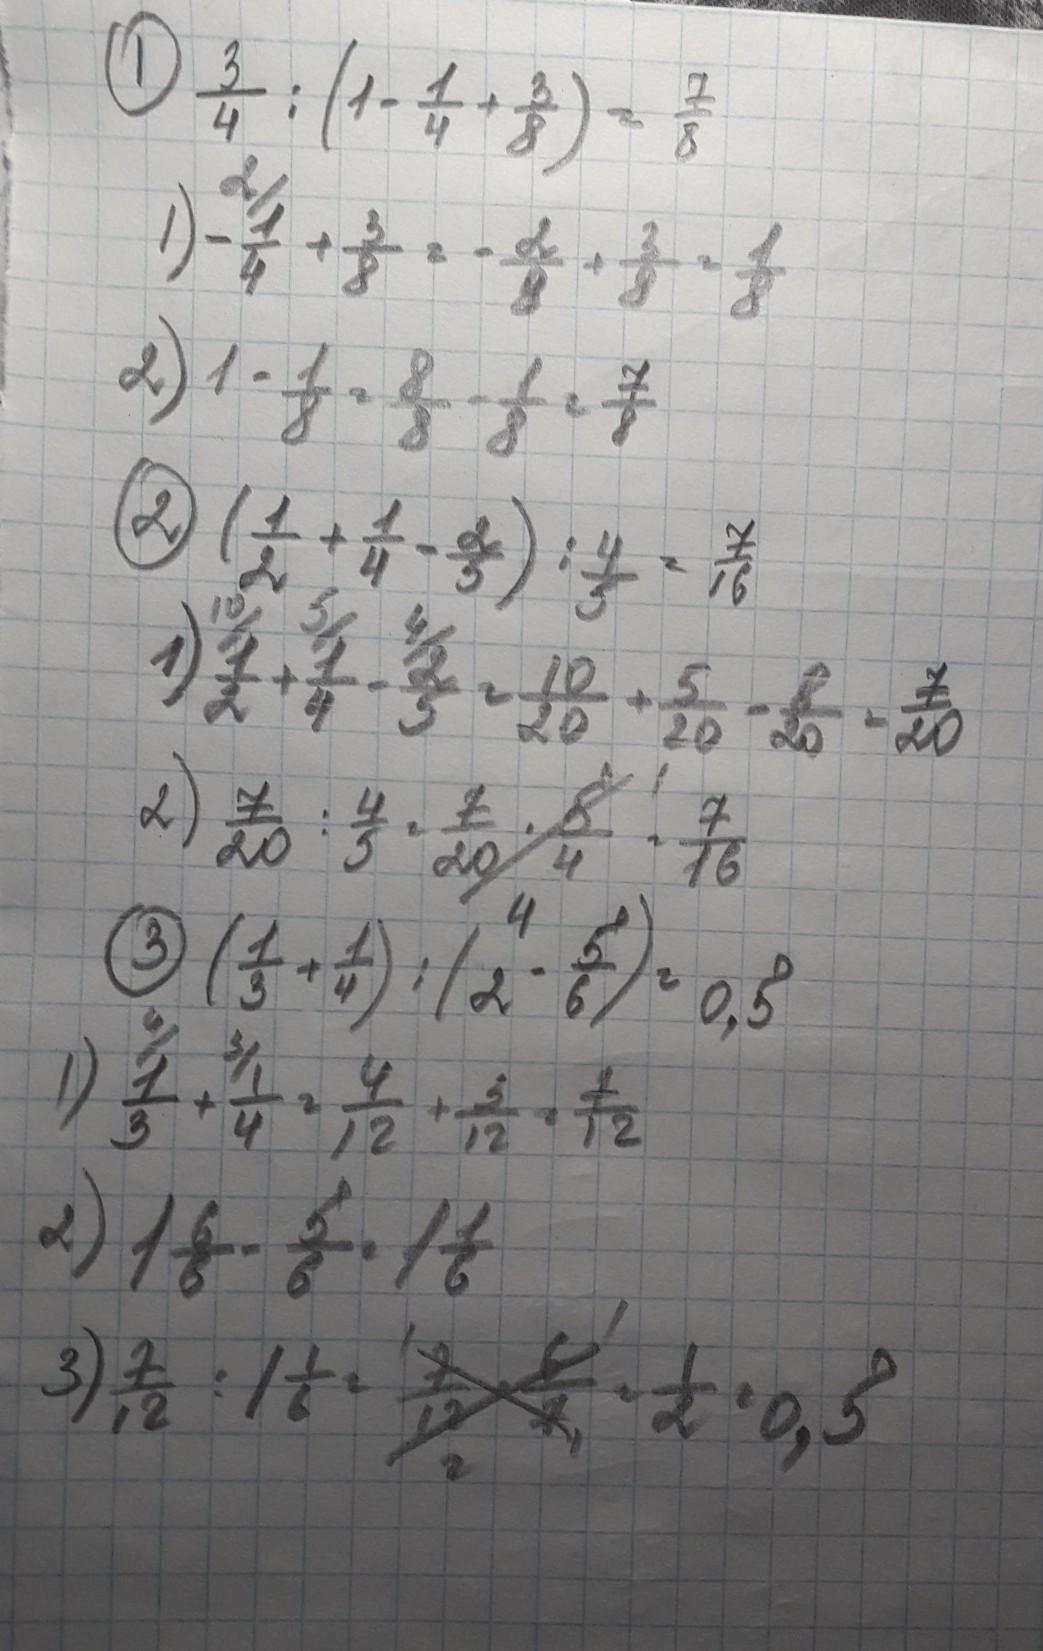 3/4:(1-1/4+3/8) ((1/2+1/4-2/5):4/5